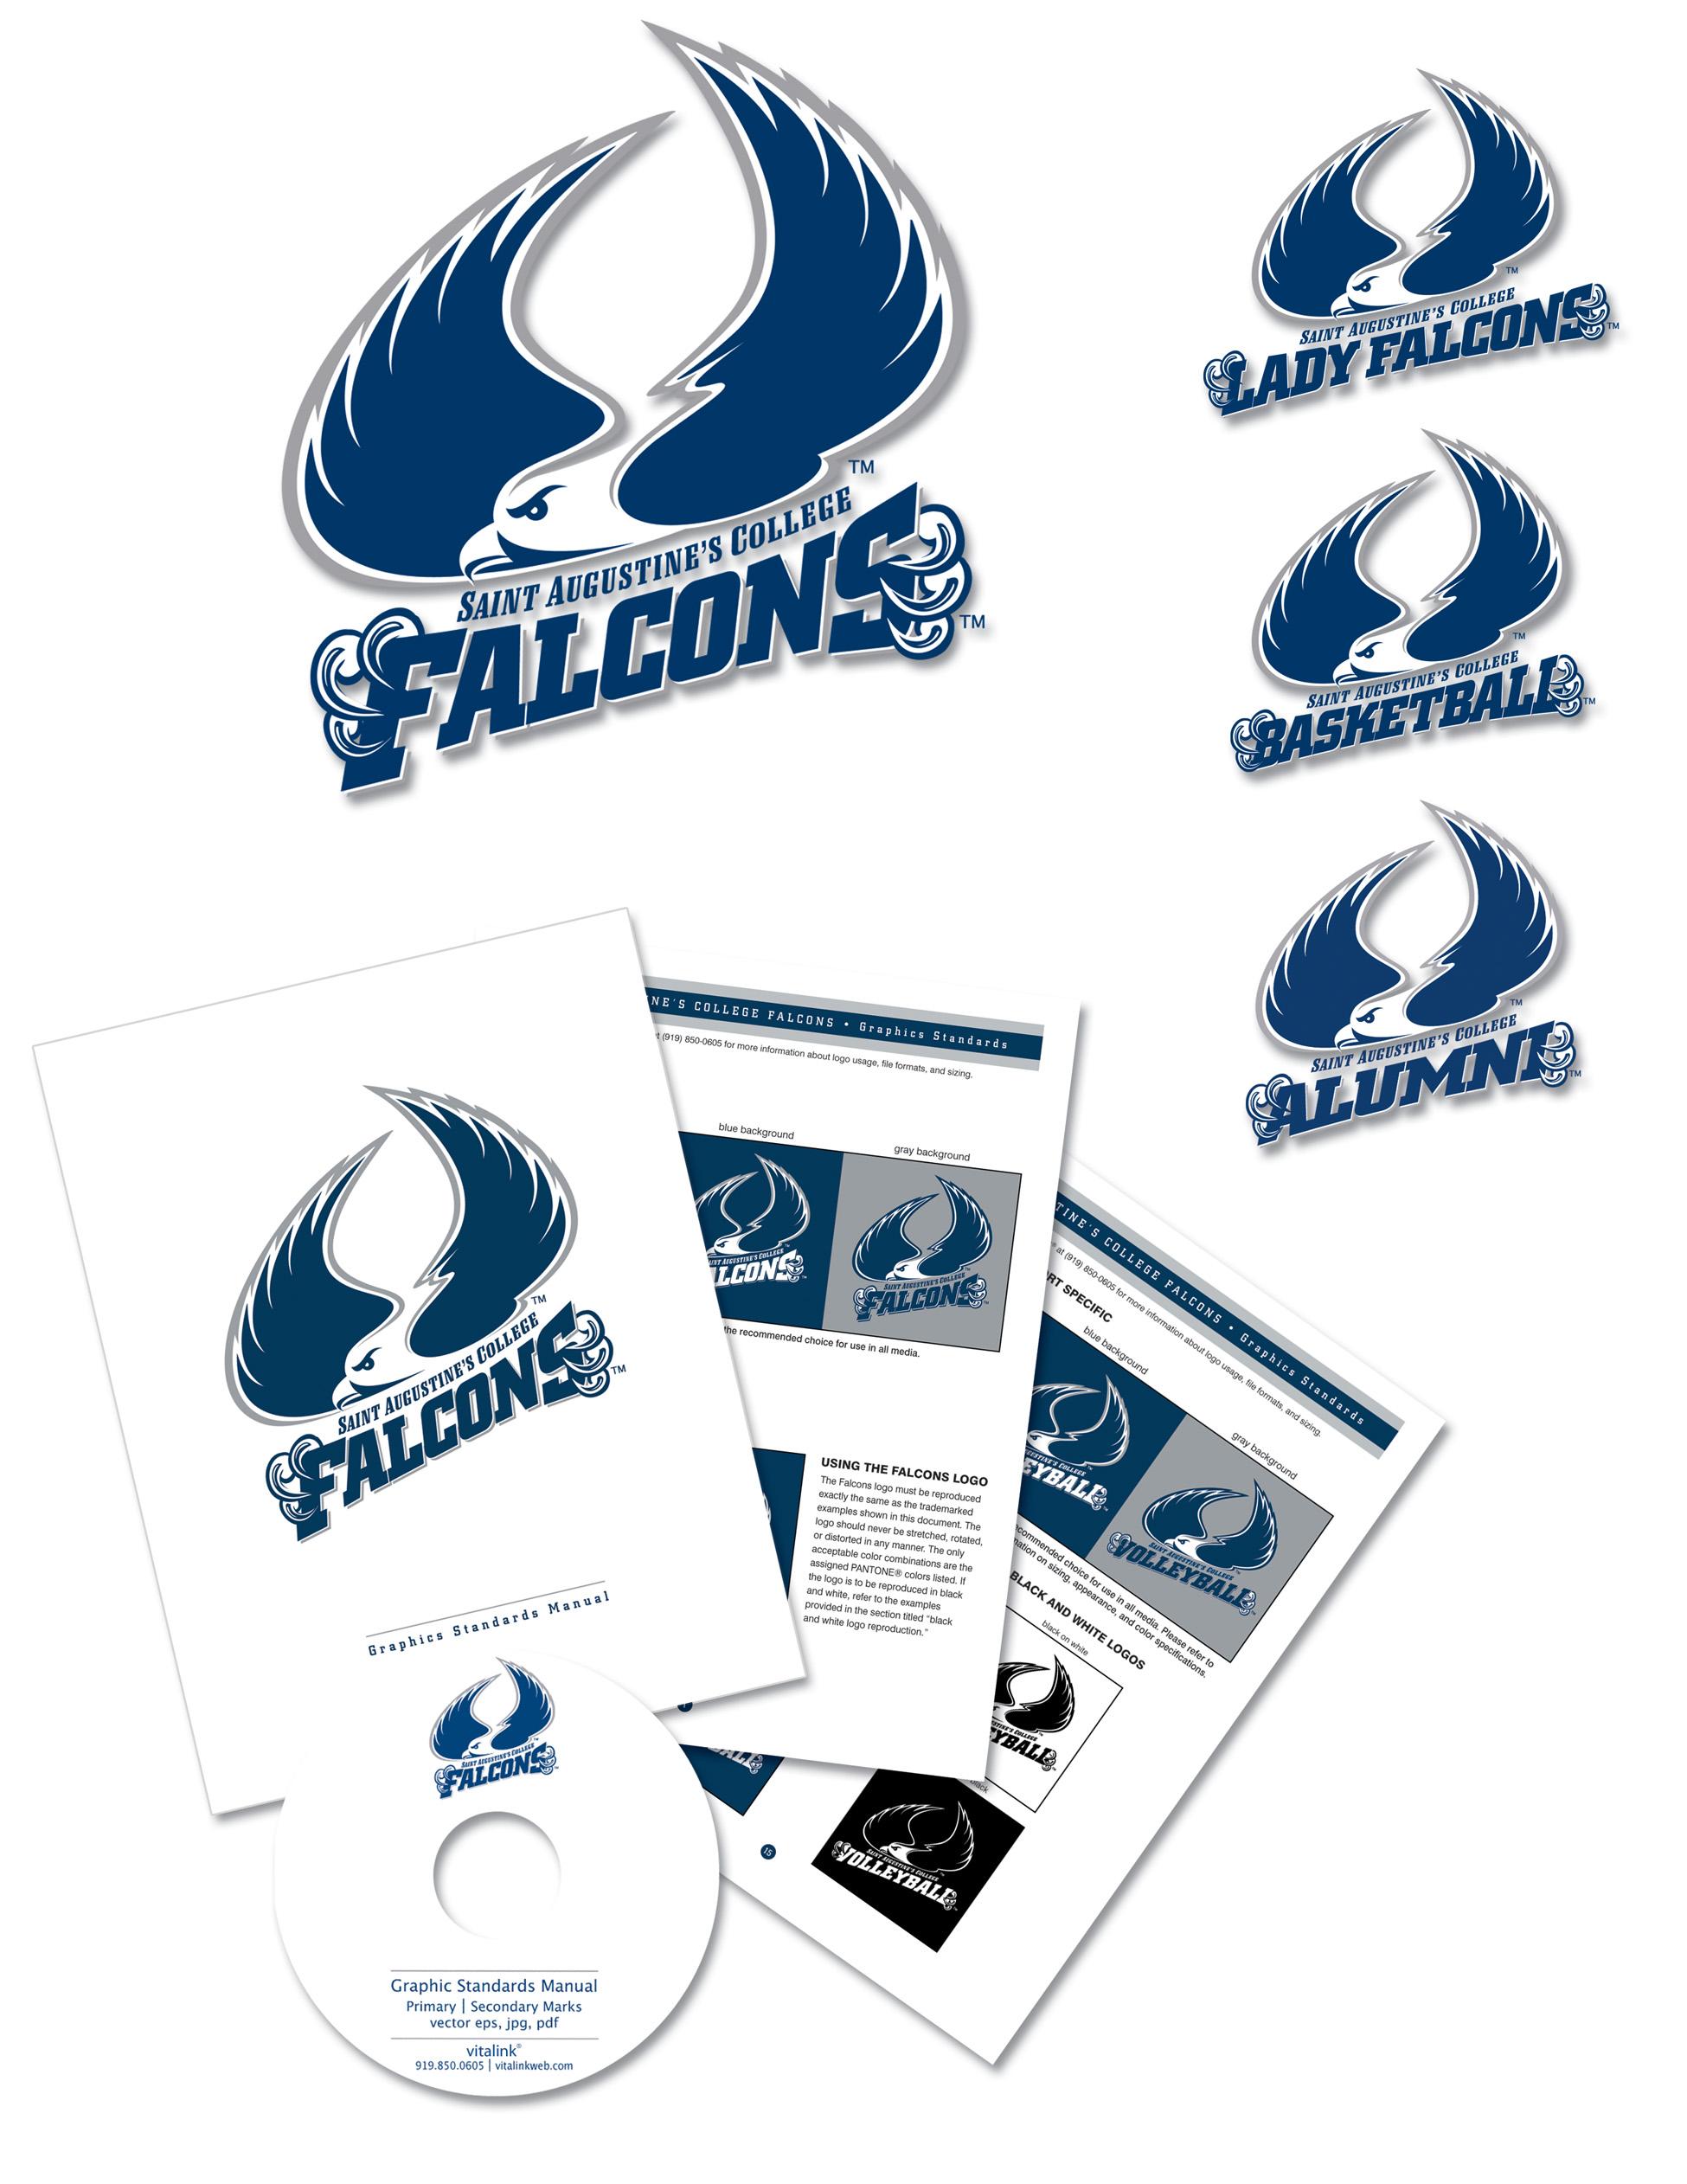 St. Augustine's sport logos by vitalink